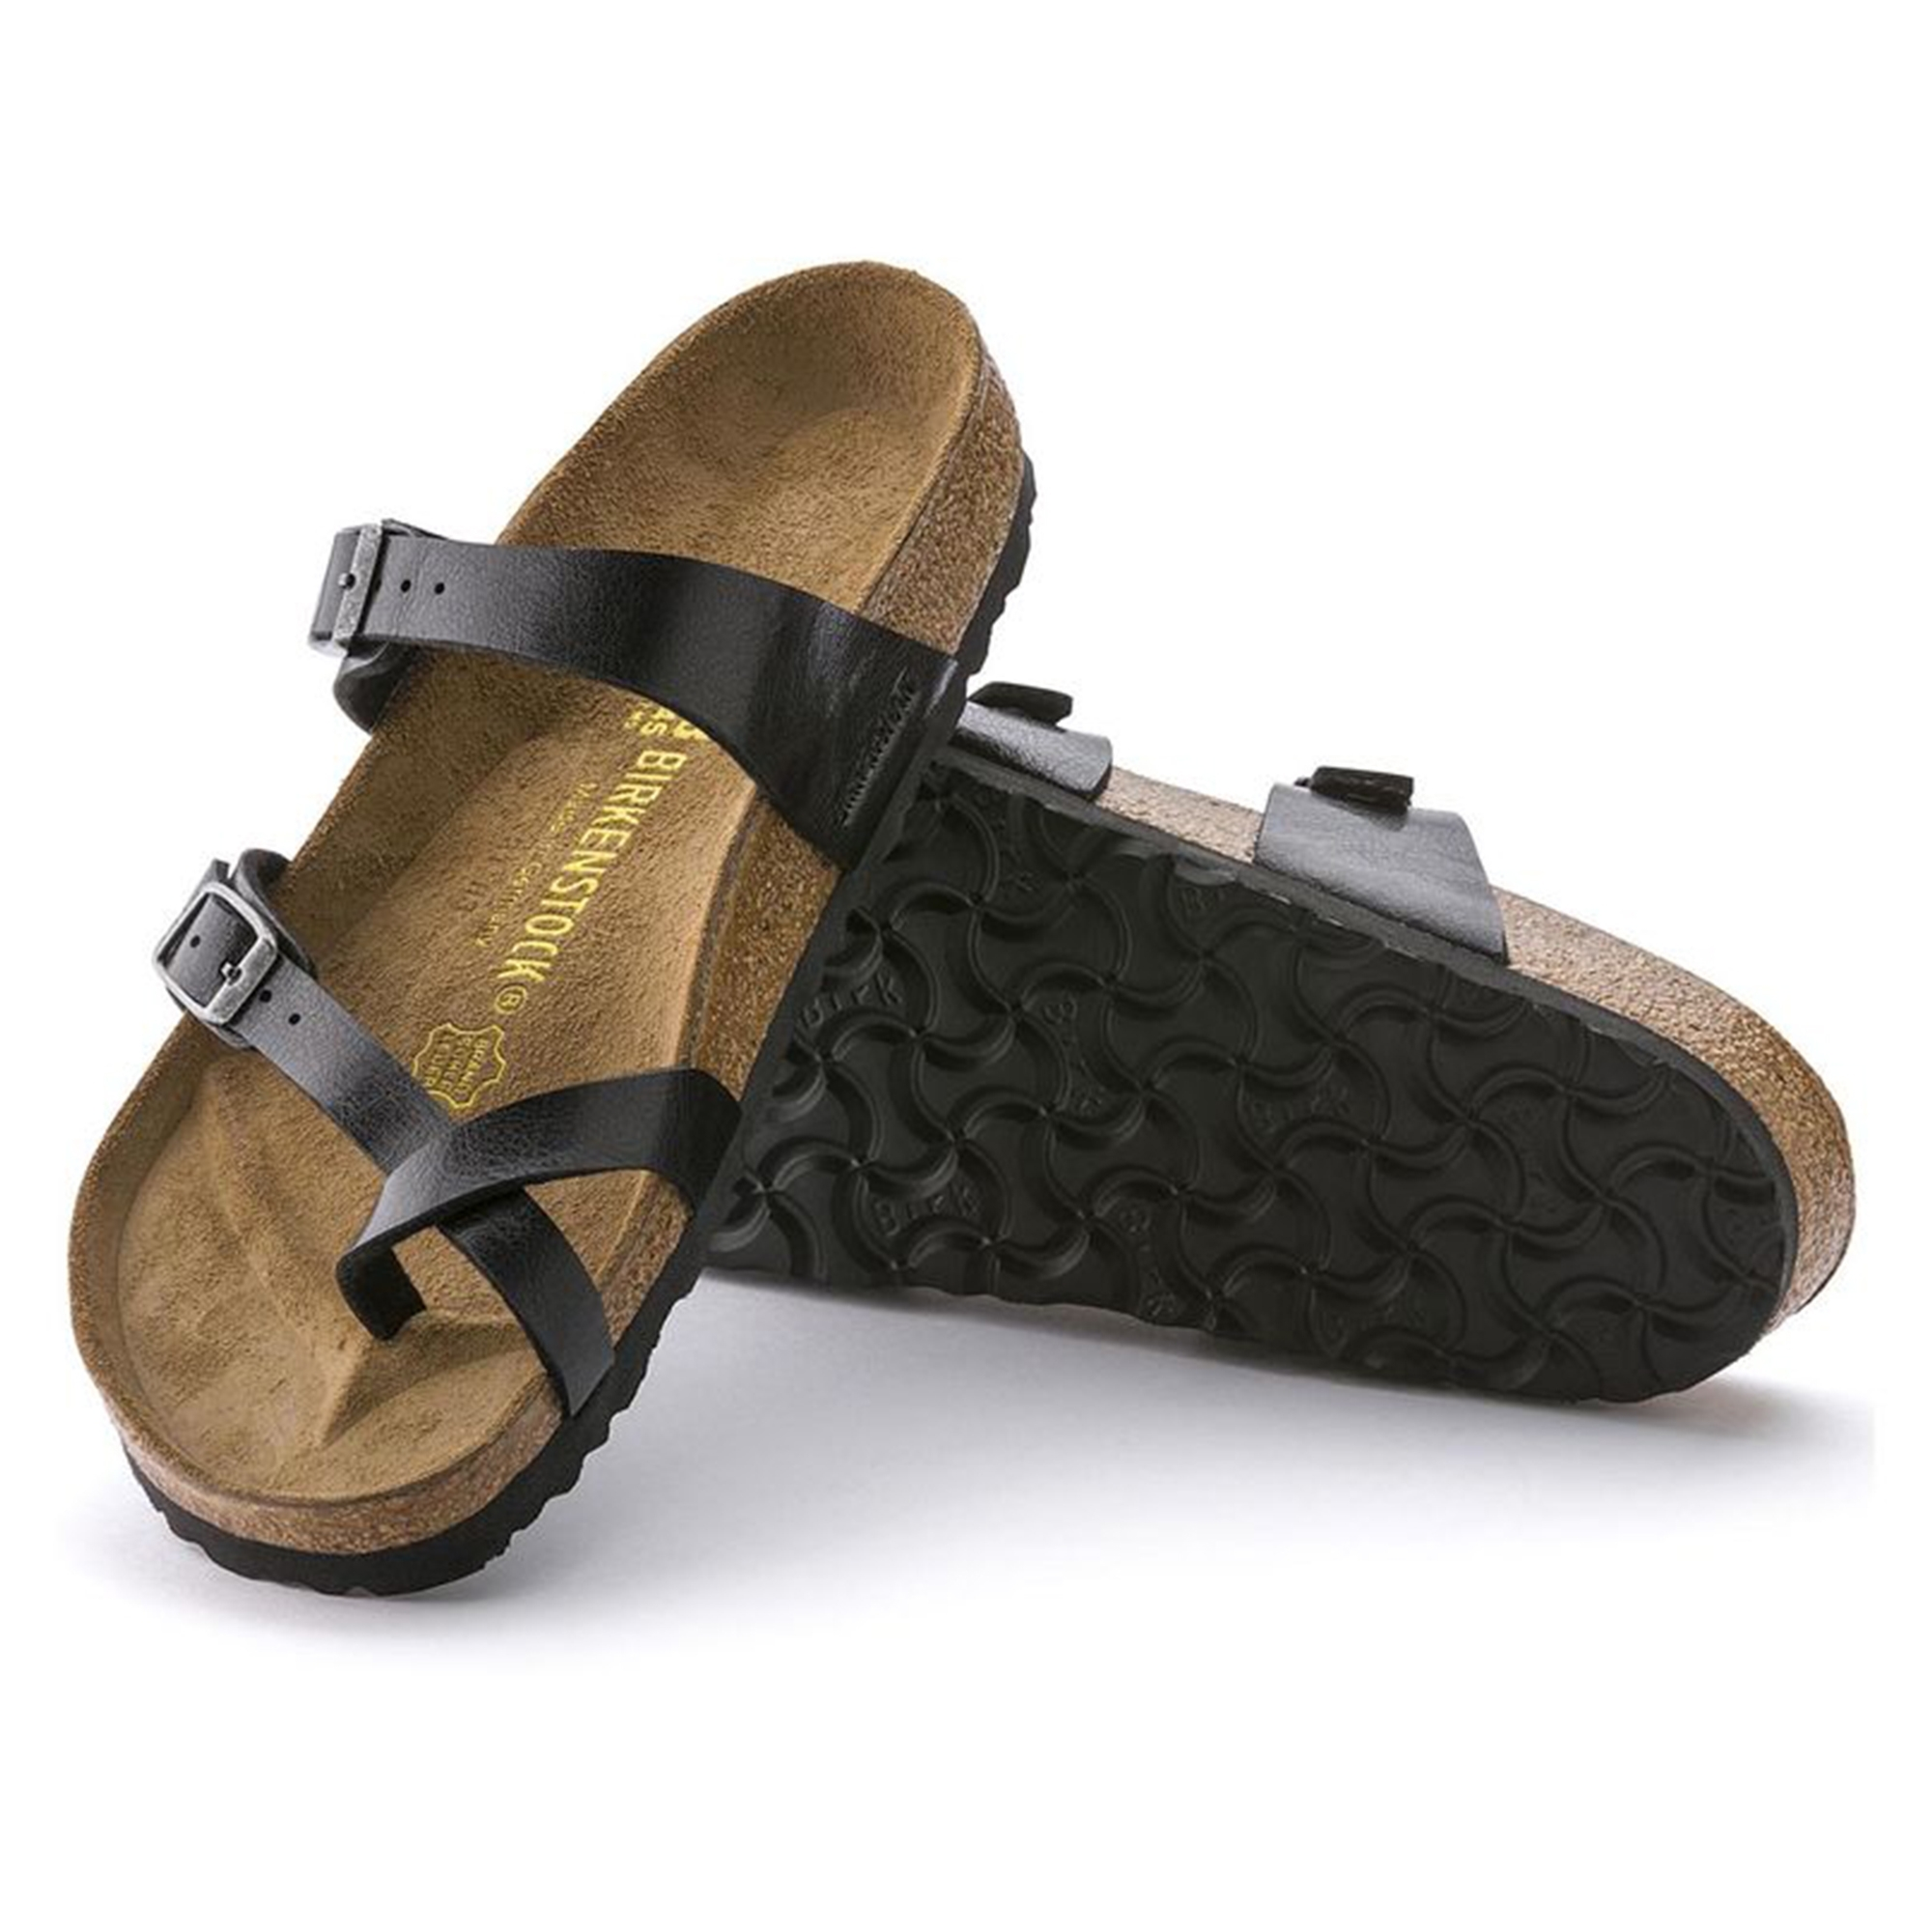 0f68a66de88 Birkenstock MAYARI 171391 Ladies Cross Strap Sandals Licorice